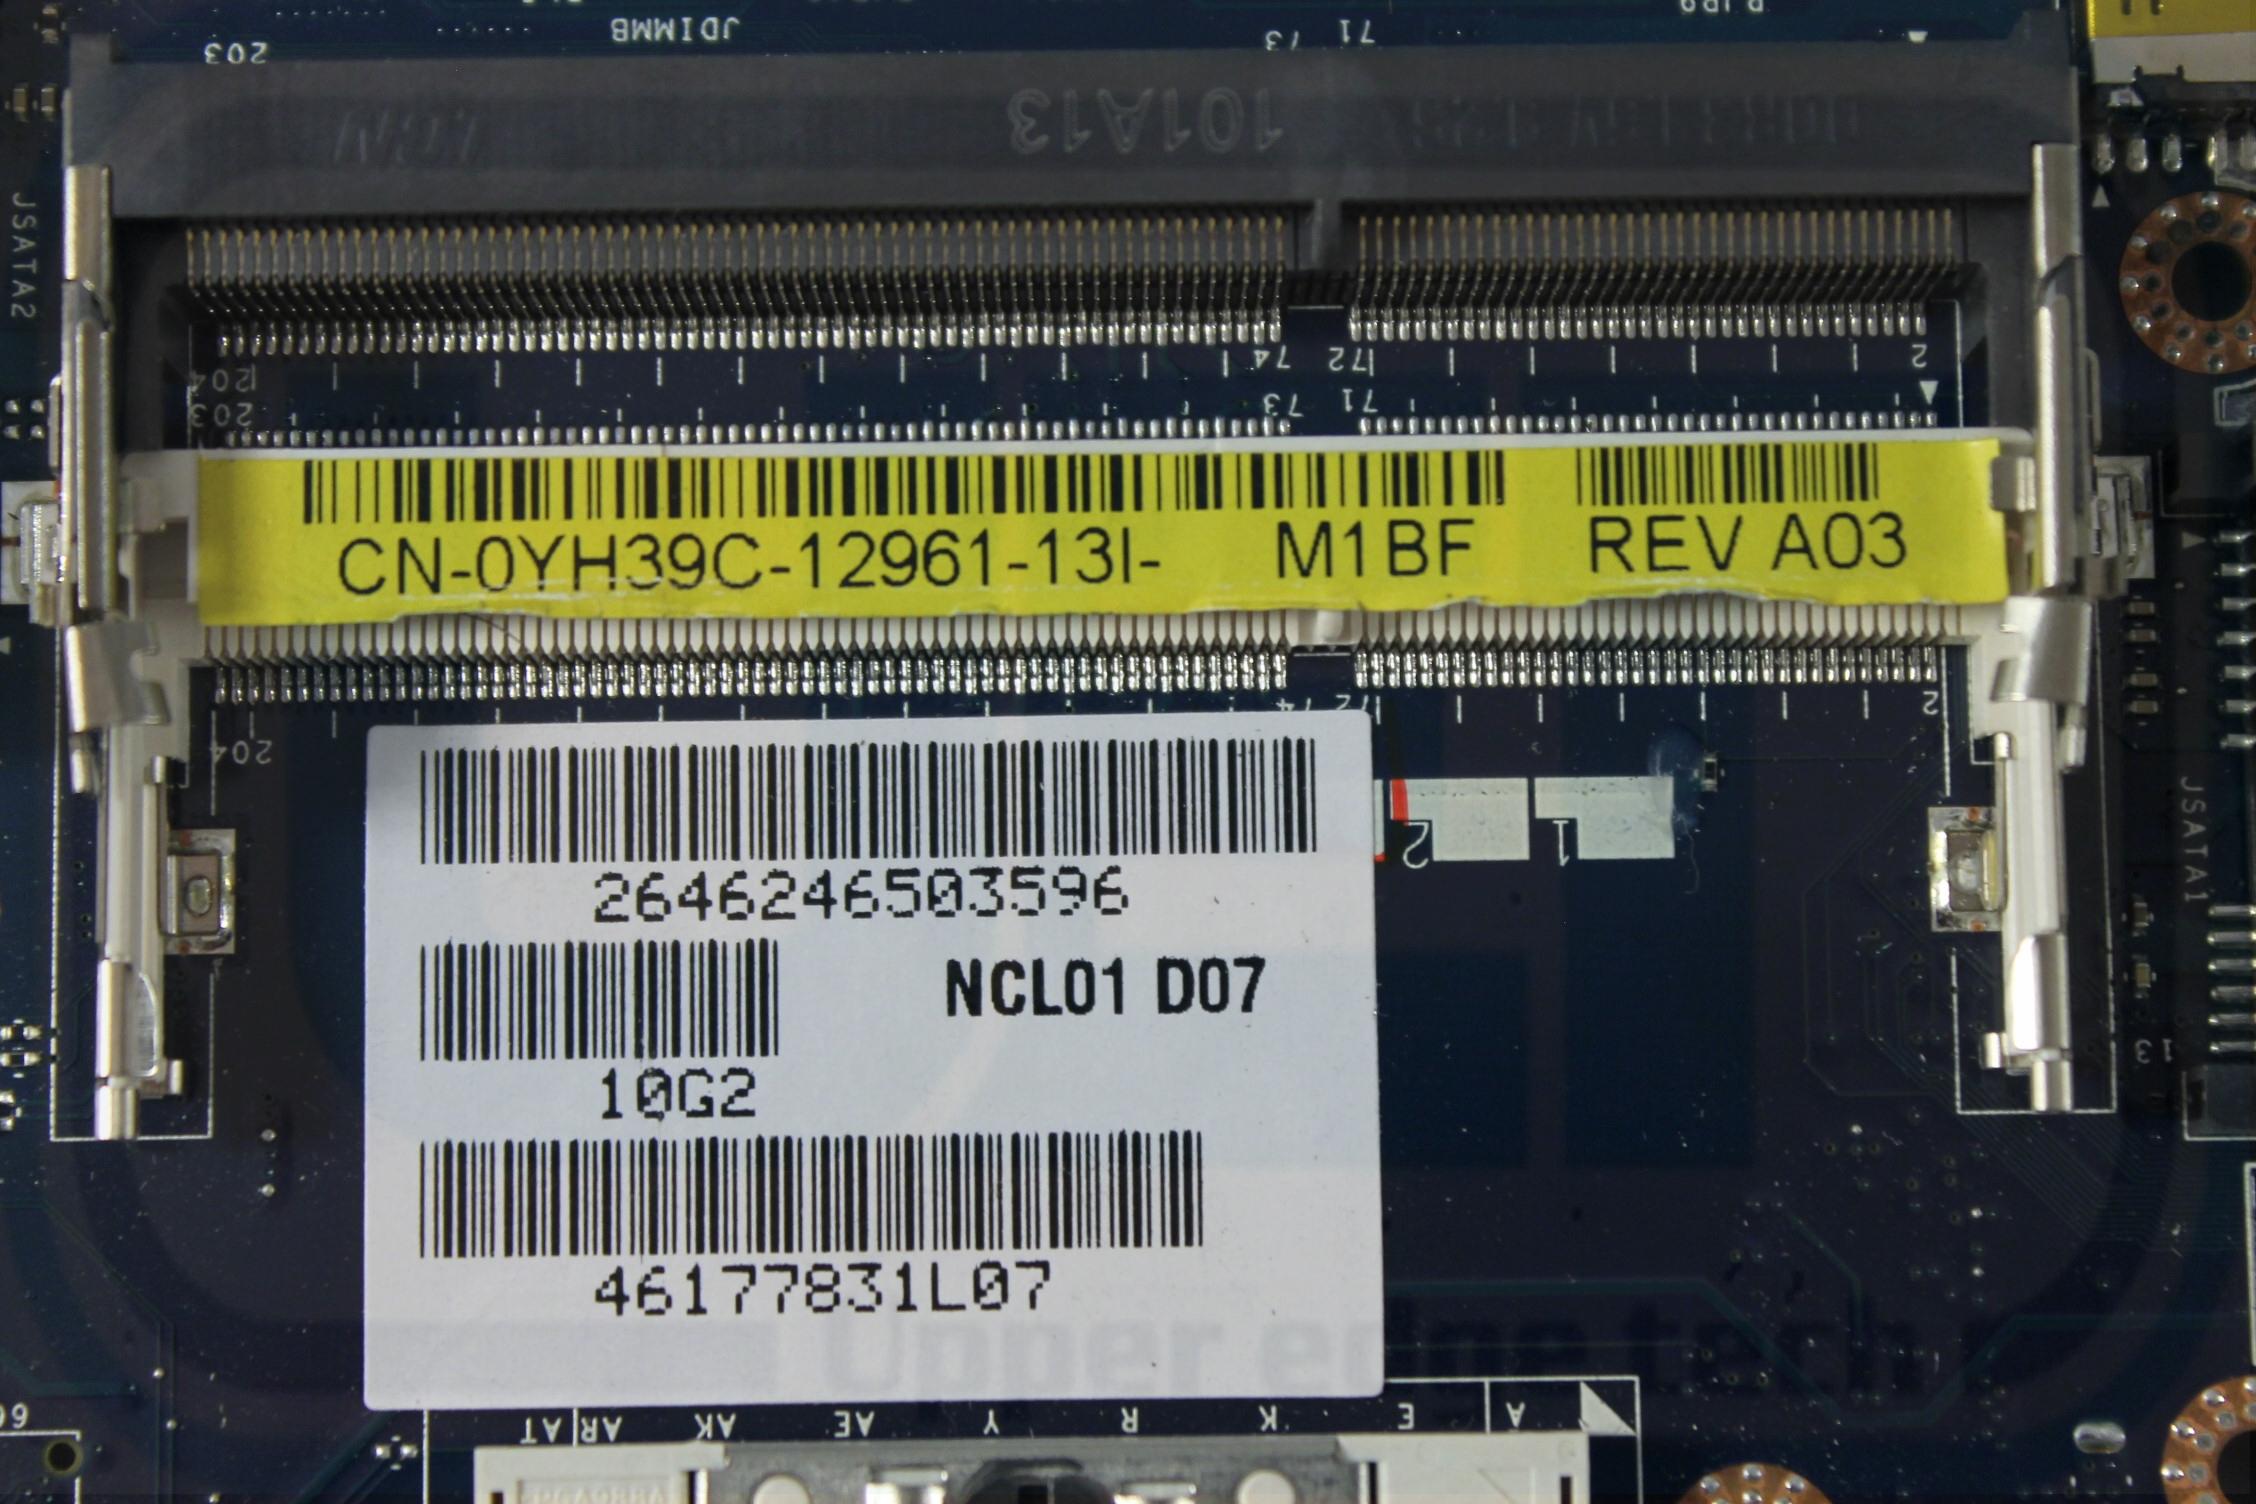 Upper Edge Technology Dell Latitude E6410 Motherboard Yh39c Nvidia